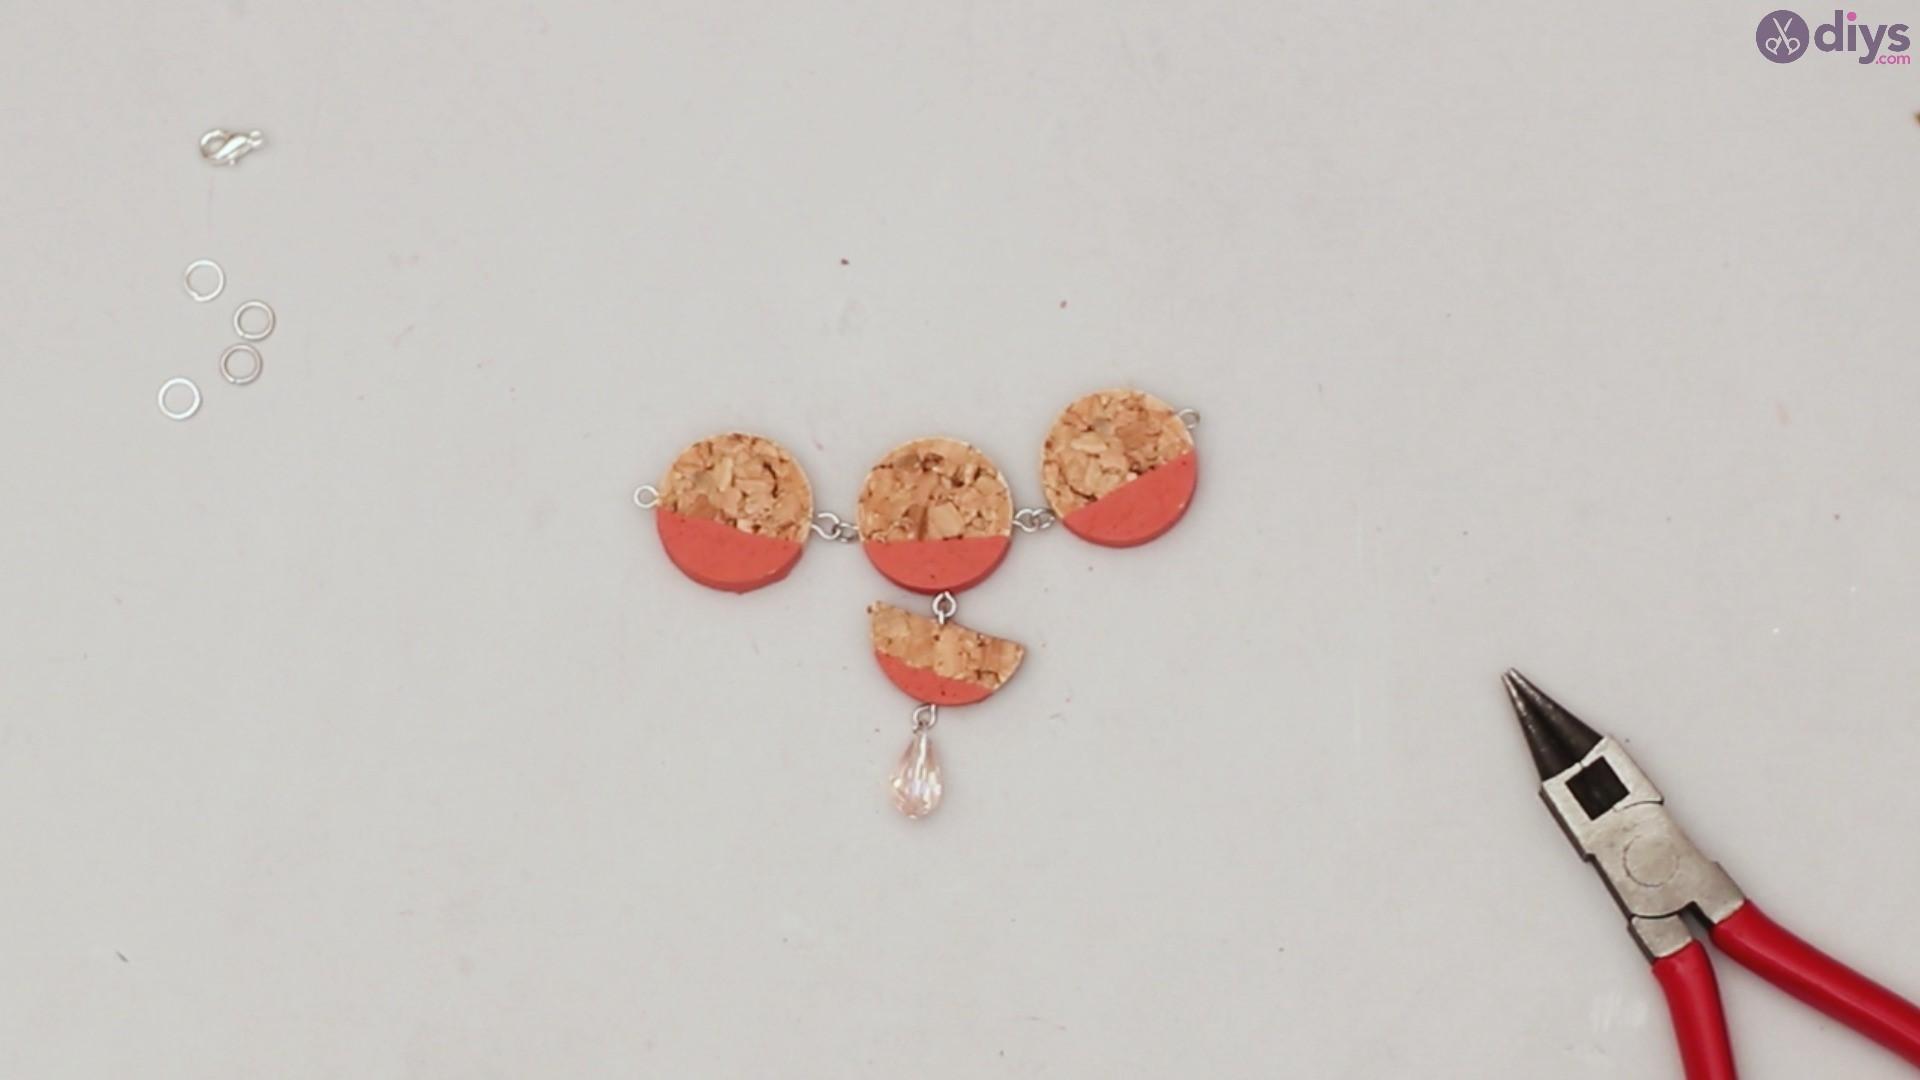 Diy wine cork necklace (43)